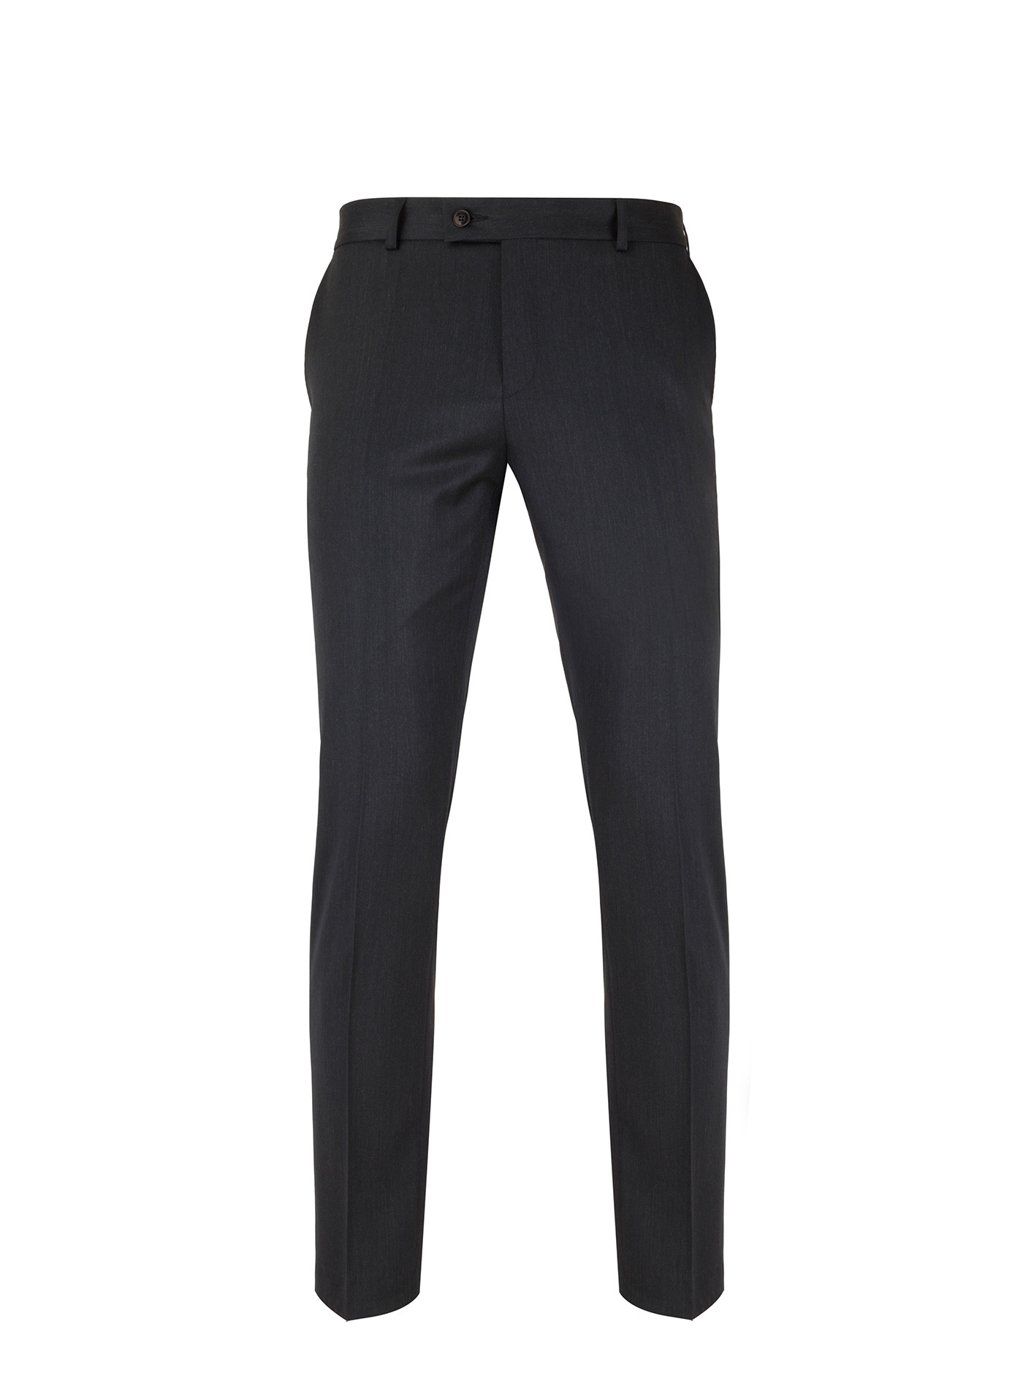 Spodnie męskie garniturowe GRENVILLE PLM-6G-164-C